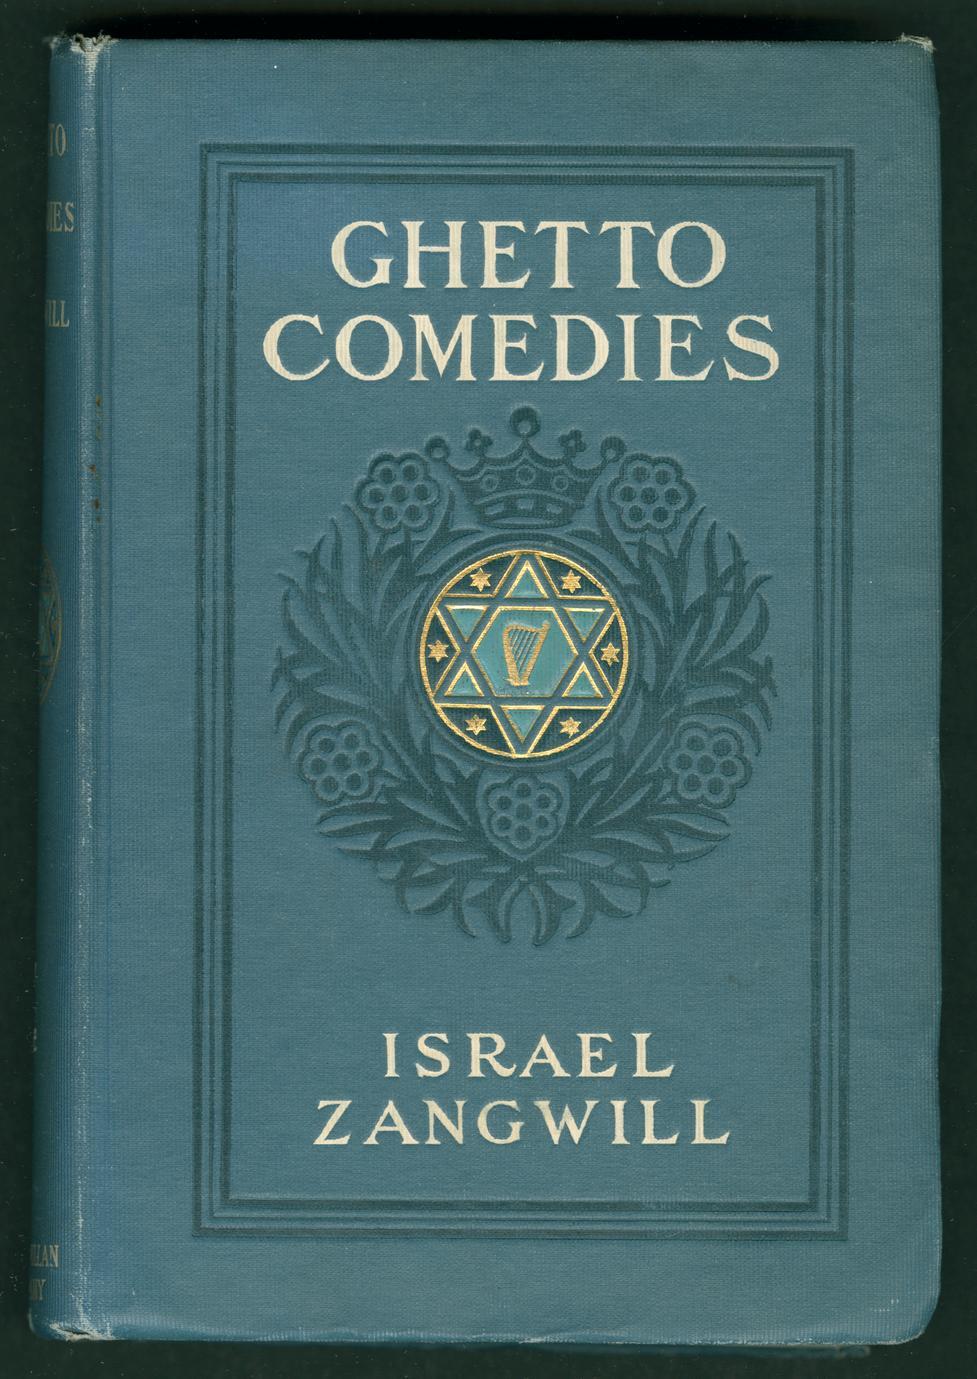 Ghetto comedies (1 of 3)